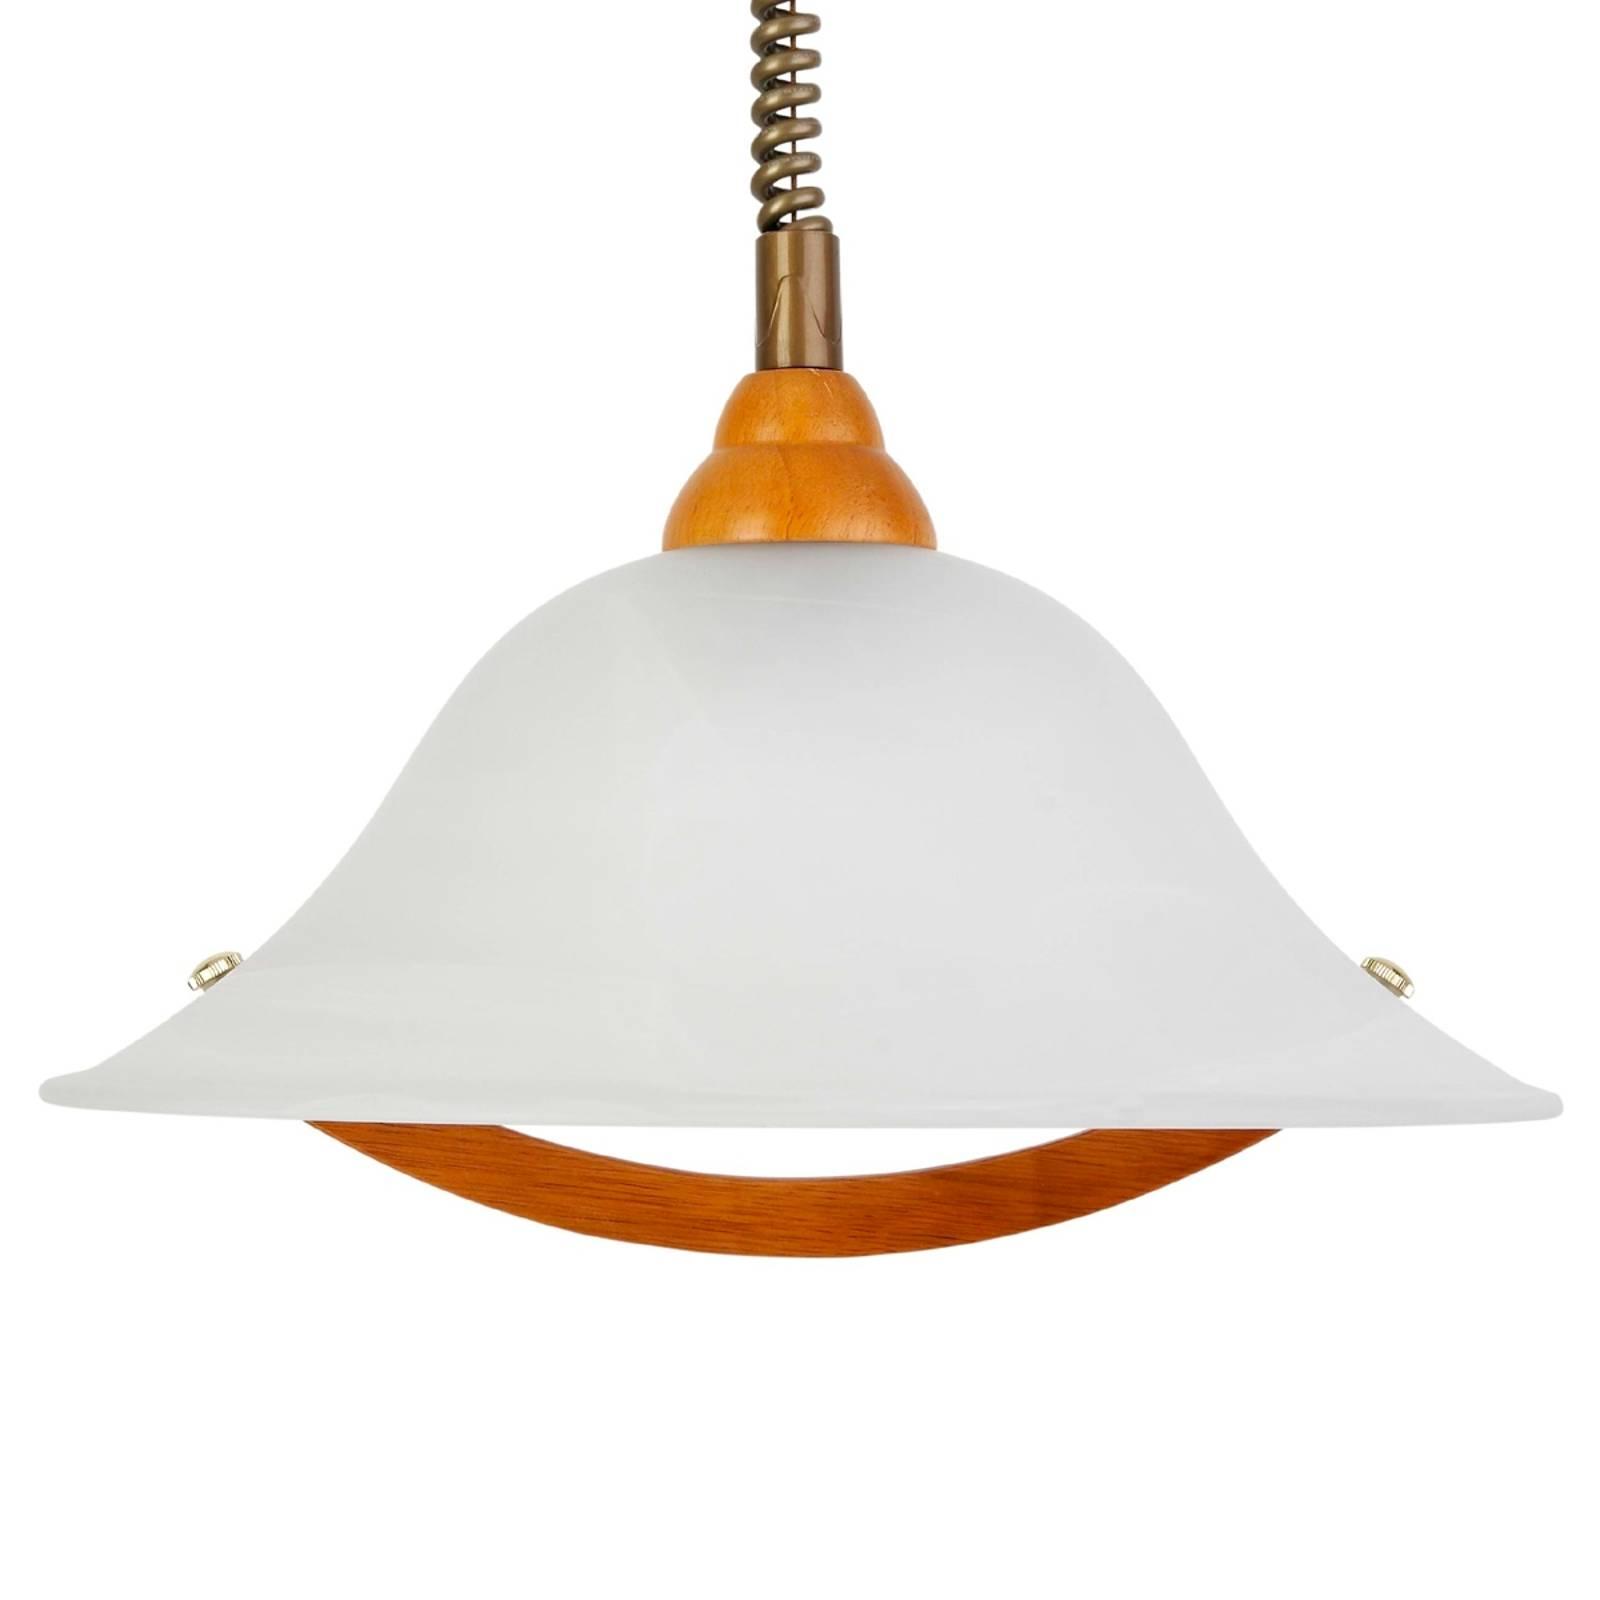 Stijlvolle hanglamp Torbole